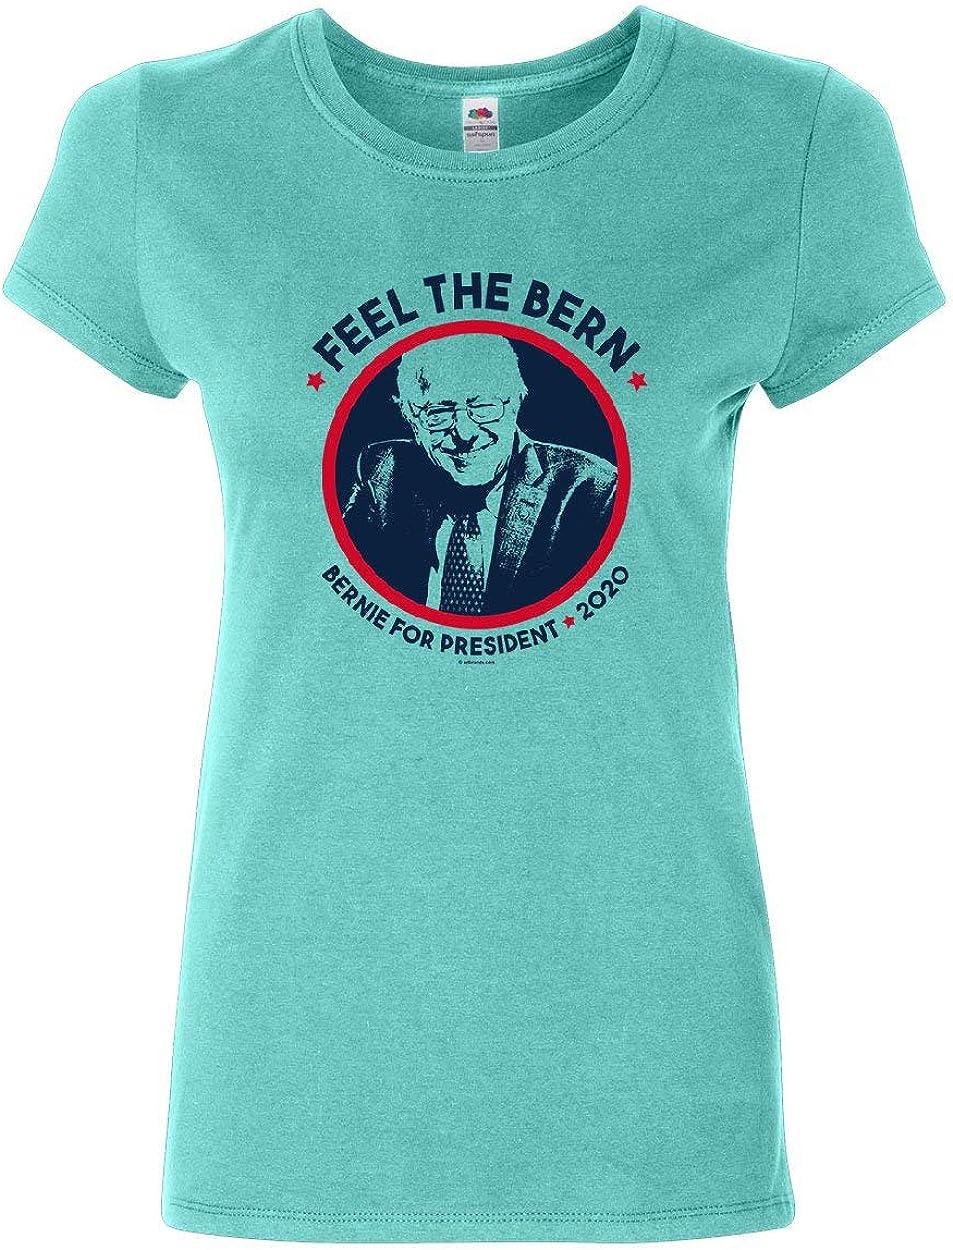 Bernie Pink 2020 Sanders T-shirt Funny USA Election Vote Feel The Bern President